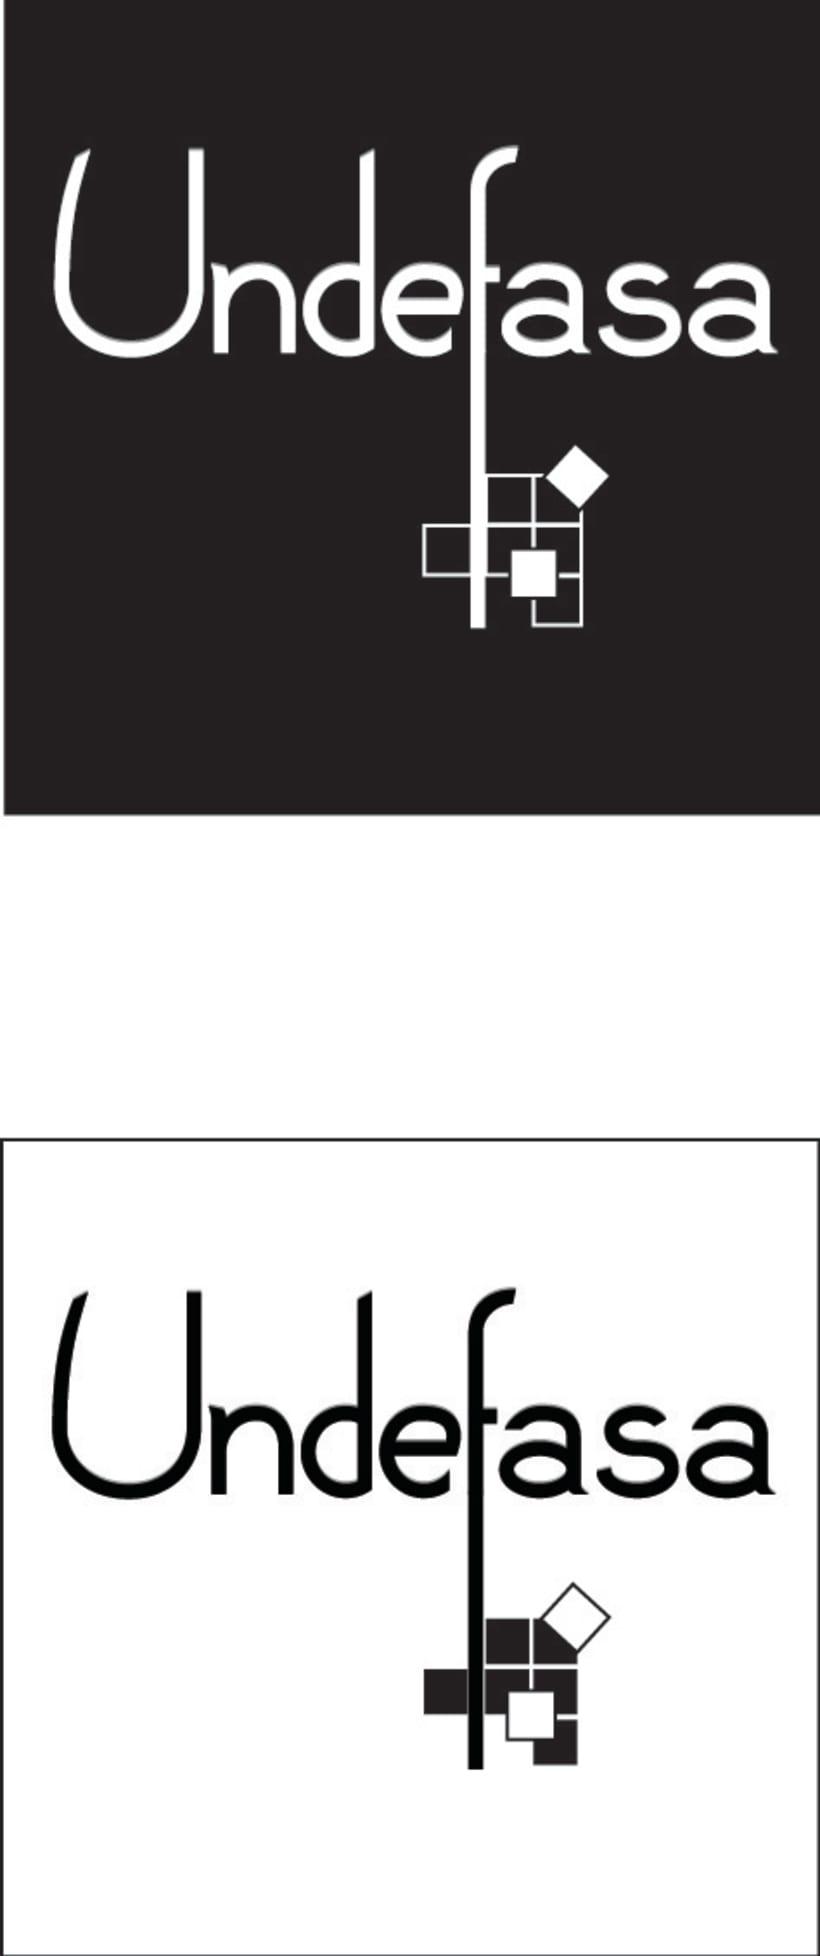 logo Undefasa 1